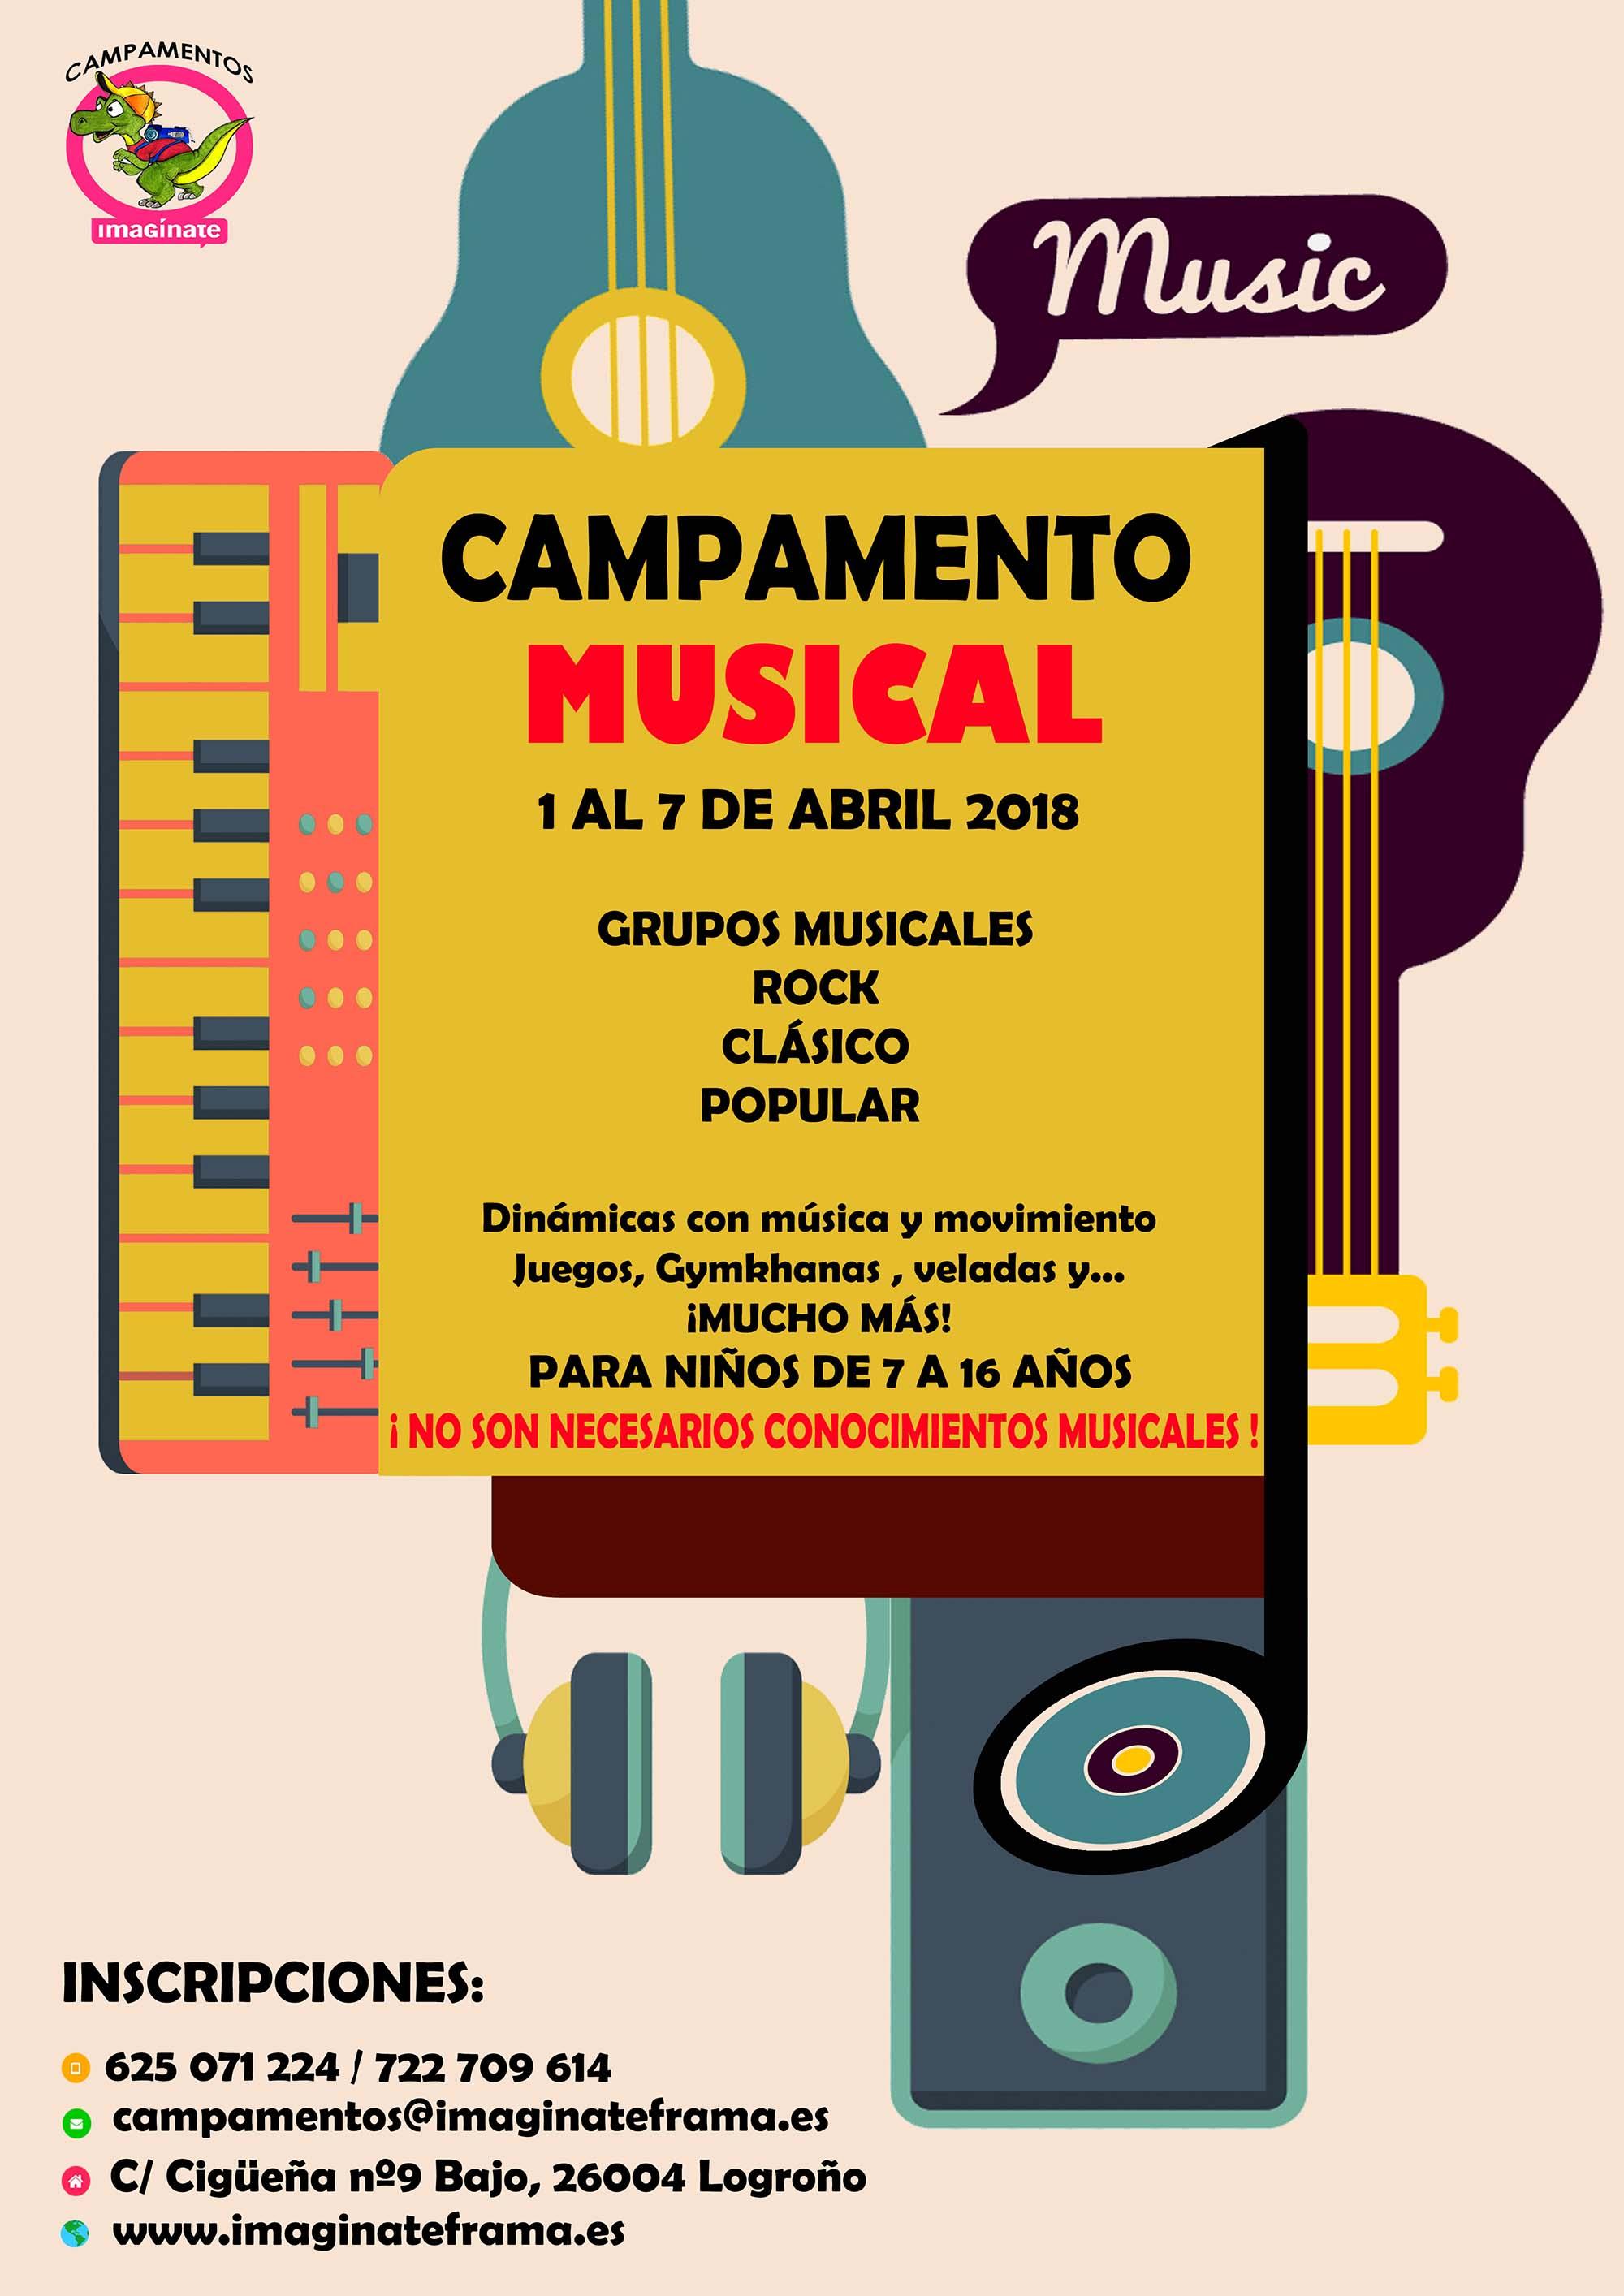 Campamento Musical Imagínate